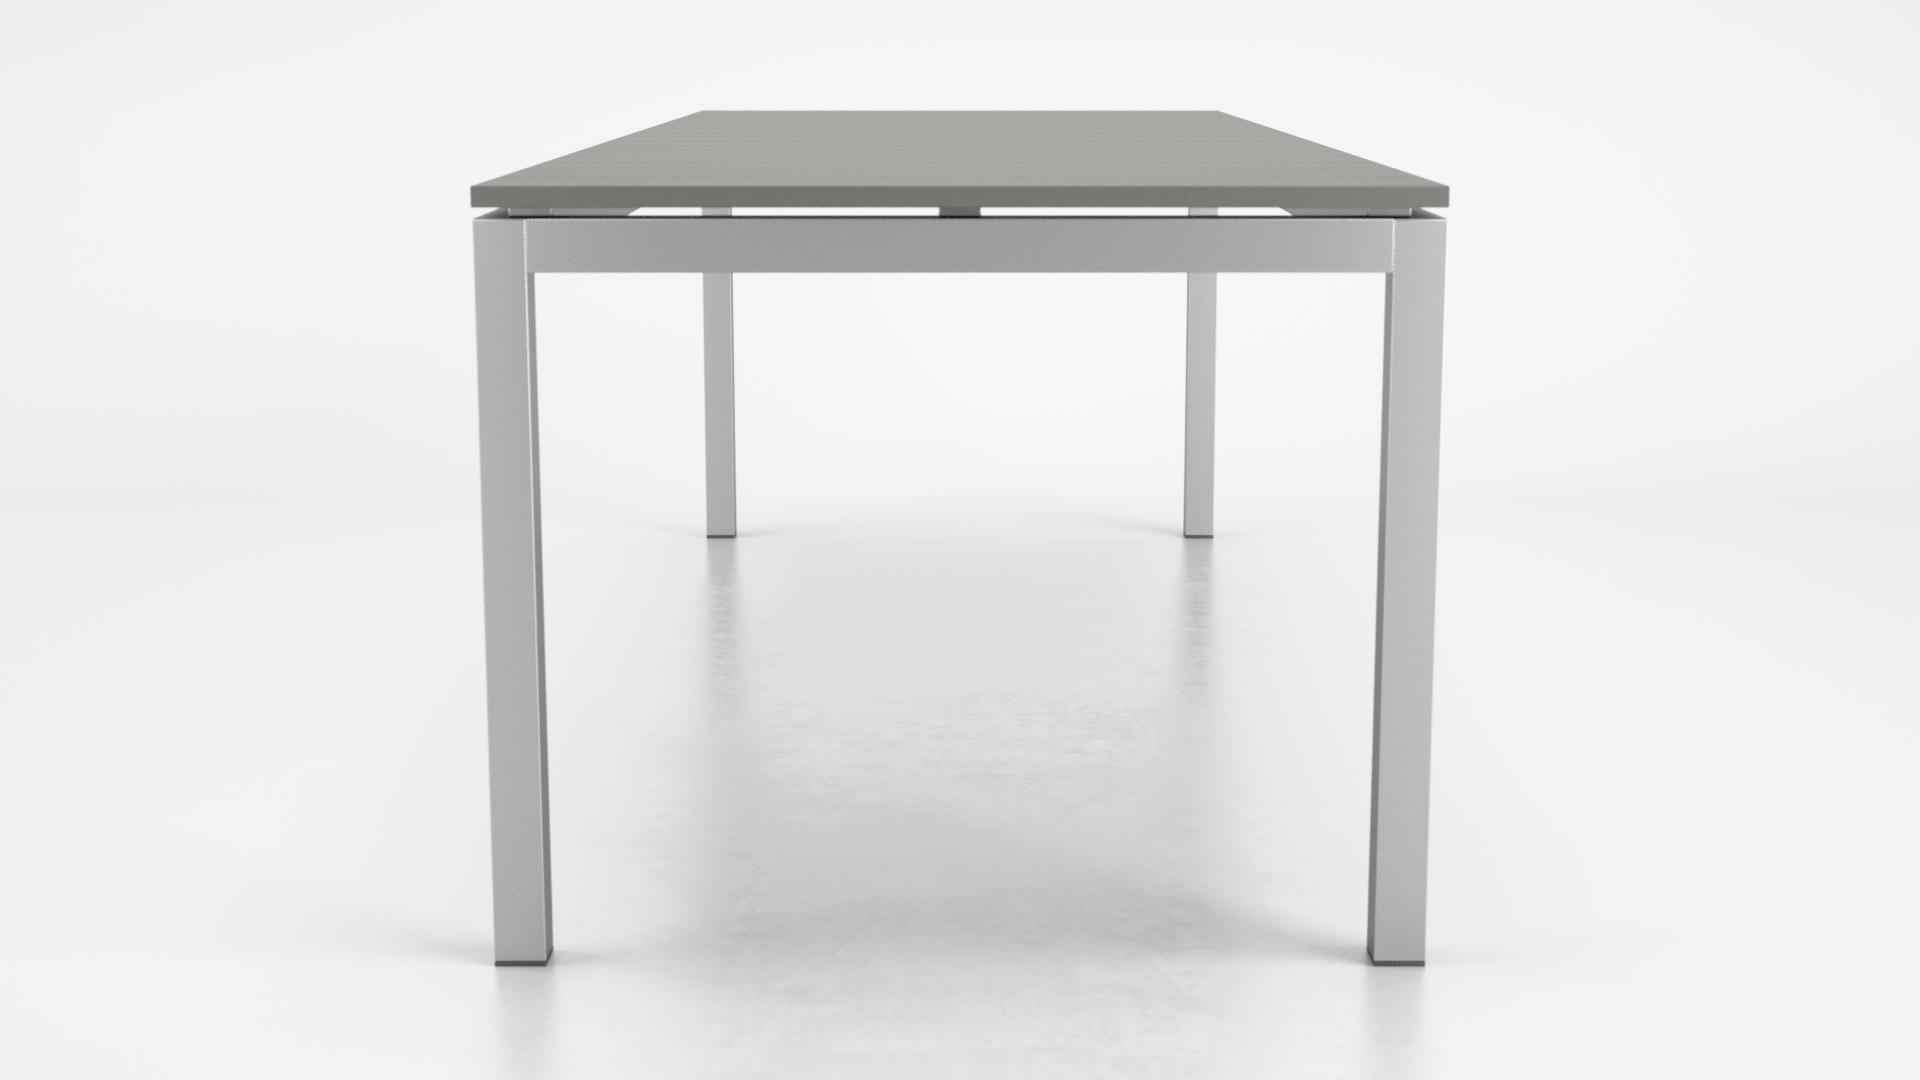 Tribu_NatalTechno_Table_WhiteSet_01_0002